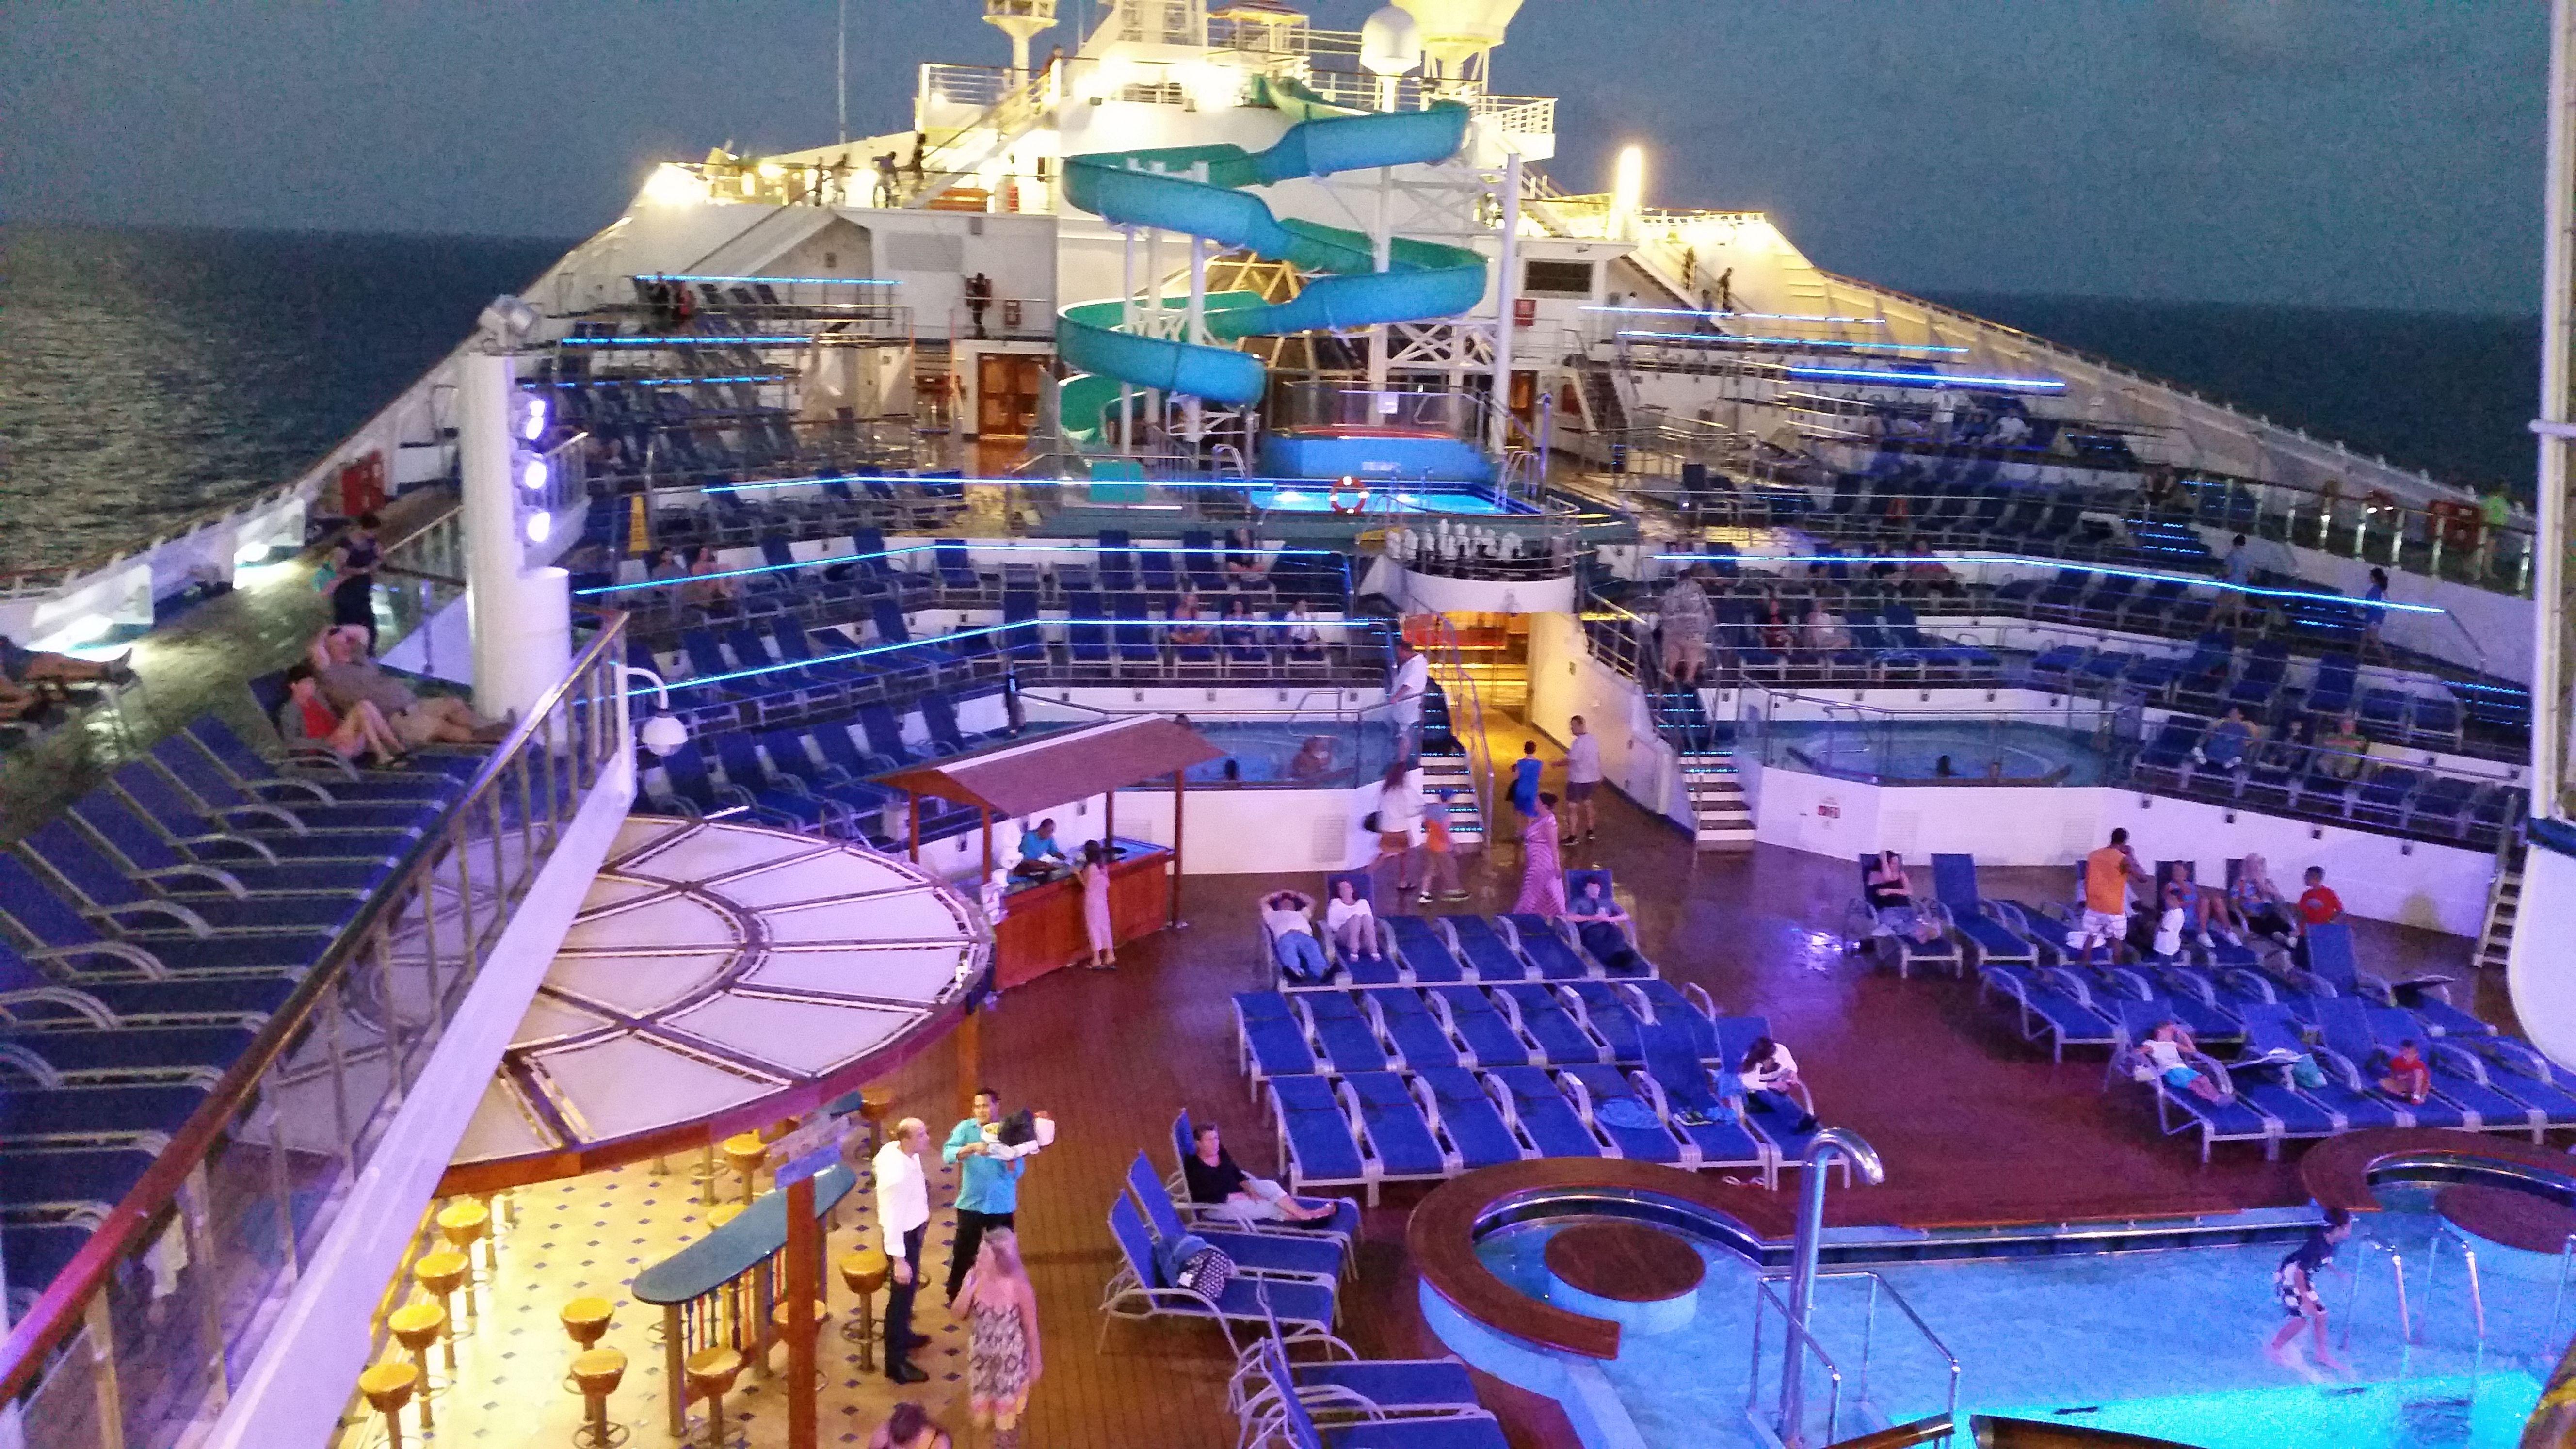 Carnival Triumph Lido Deck Pool Cruising The Open Sea Pinterest Carnival Cruises And